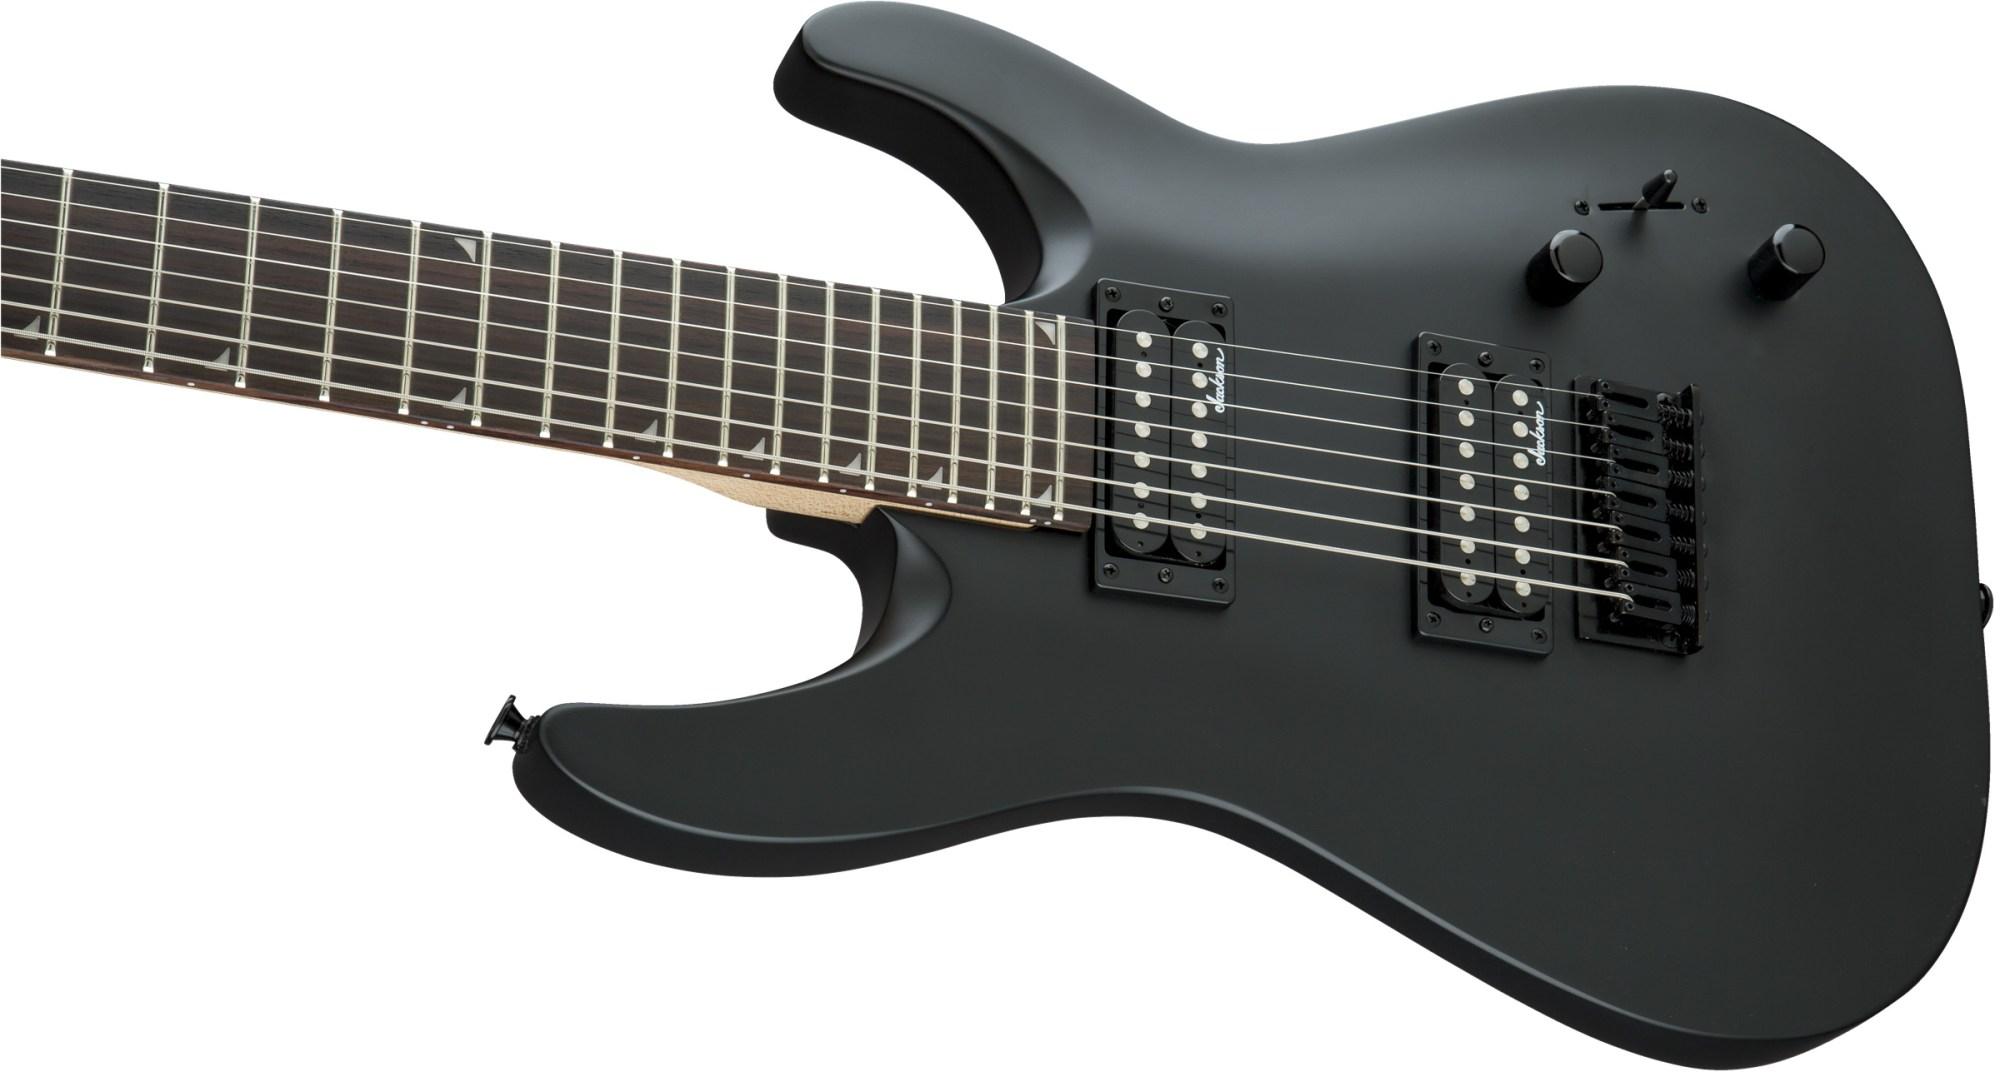 hight resolution of jackson guitar pick up j90c wiring diagram trusted wiring diagrams guitar wiring diagrams bc rich warlock